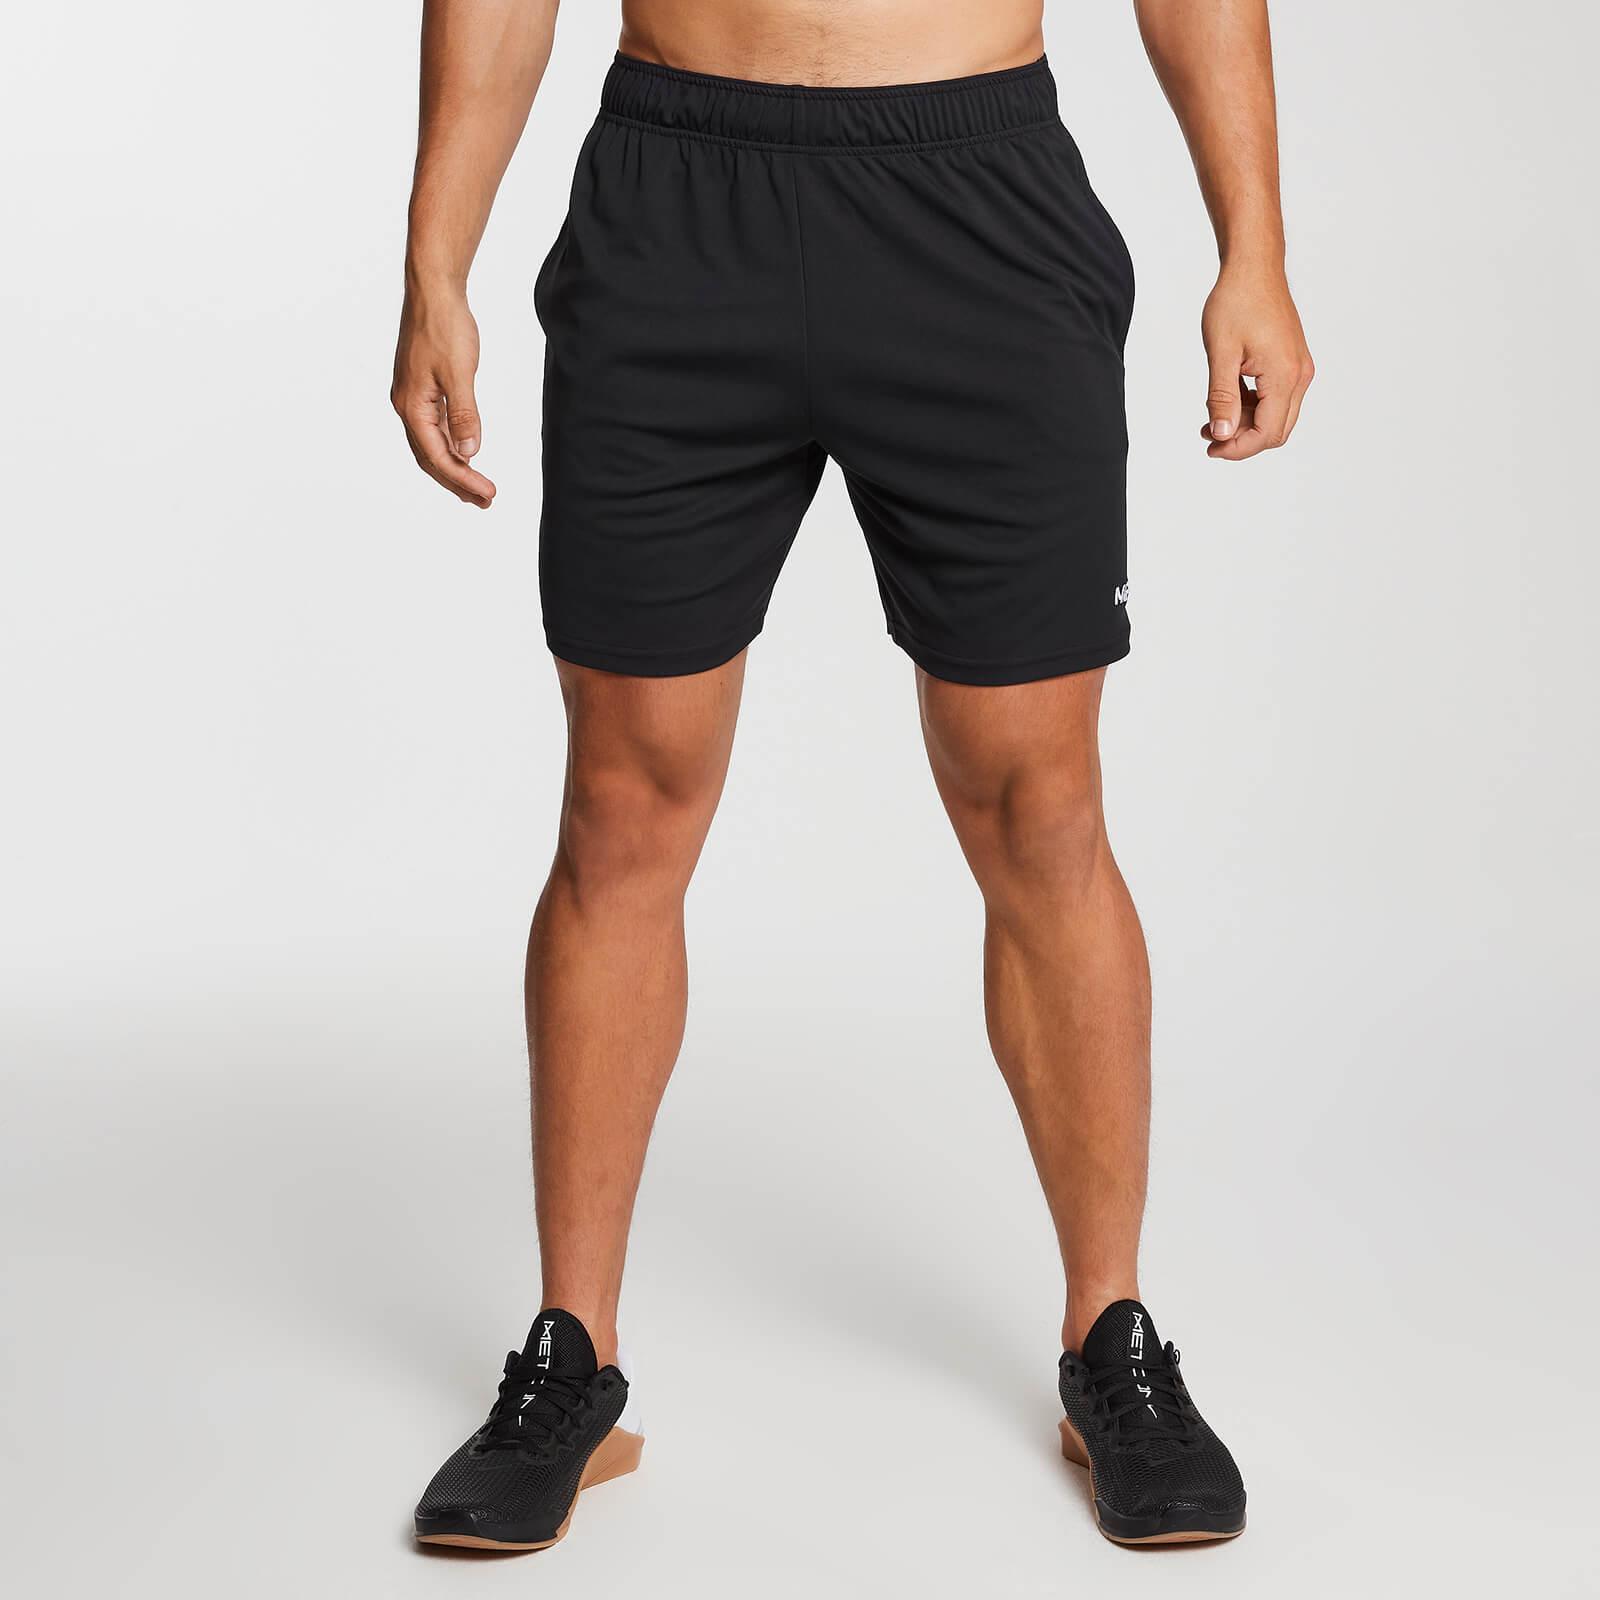 MP Essential Lightweight Jersey Training Shorts - Sort - Xxs